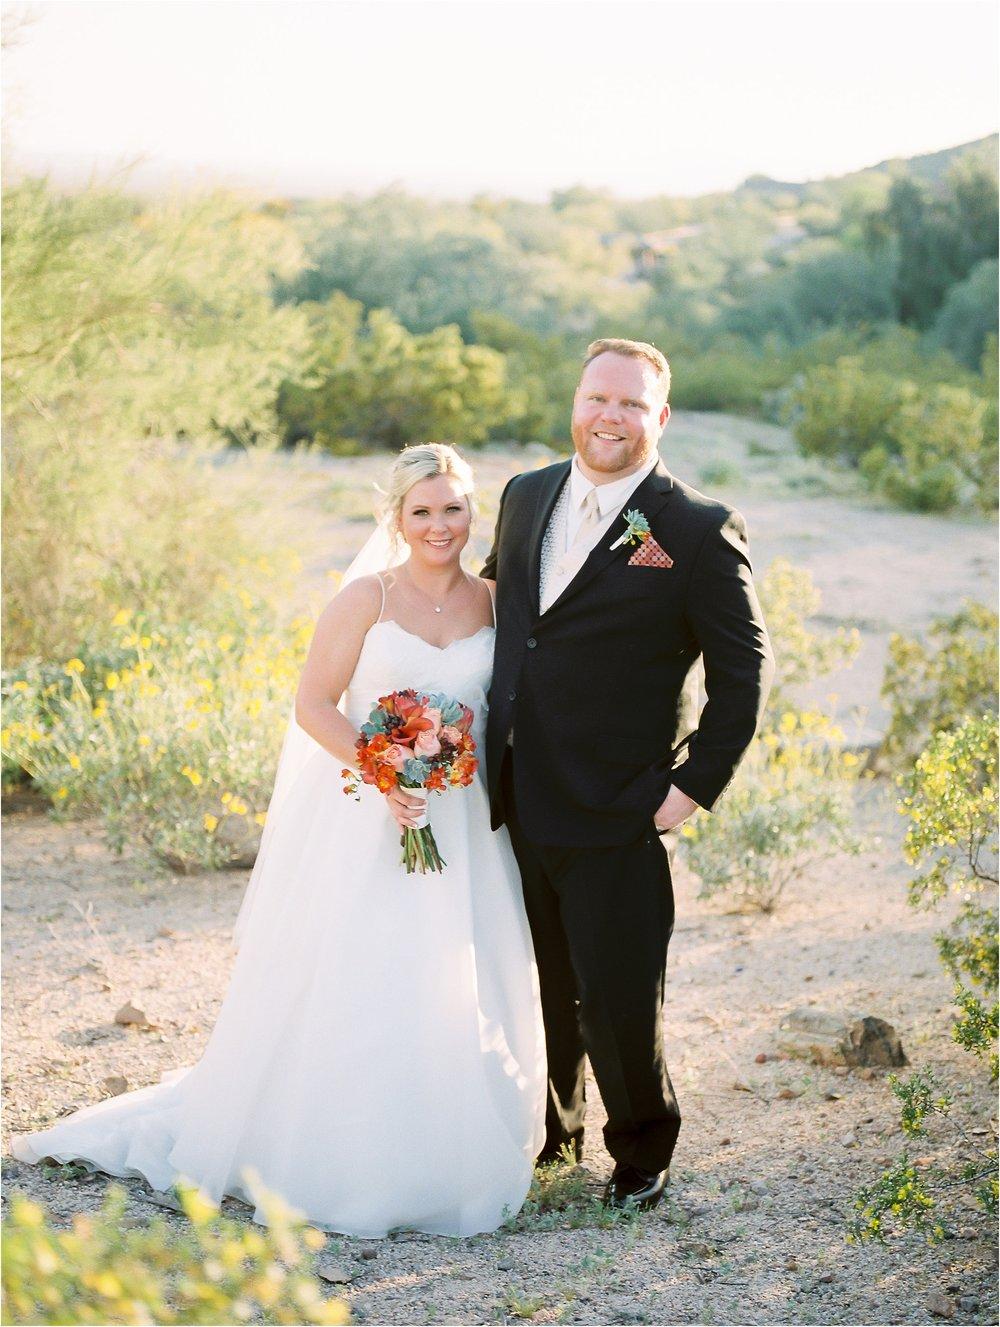 Sarah Jane Photography Film Hybrid Scottsdale Phoenix Arizona Destination Wedding Photographer Scott and Rachel_0029.jpg